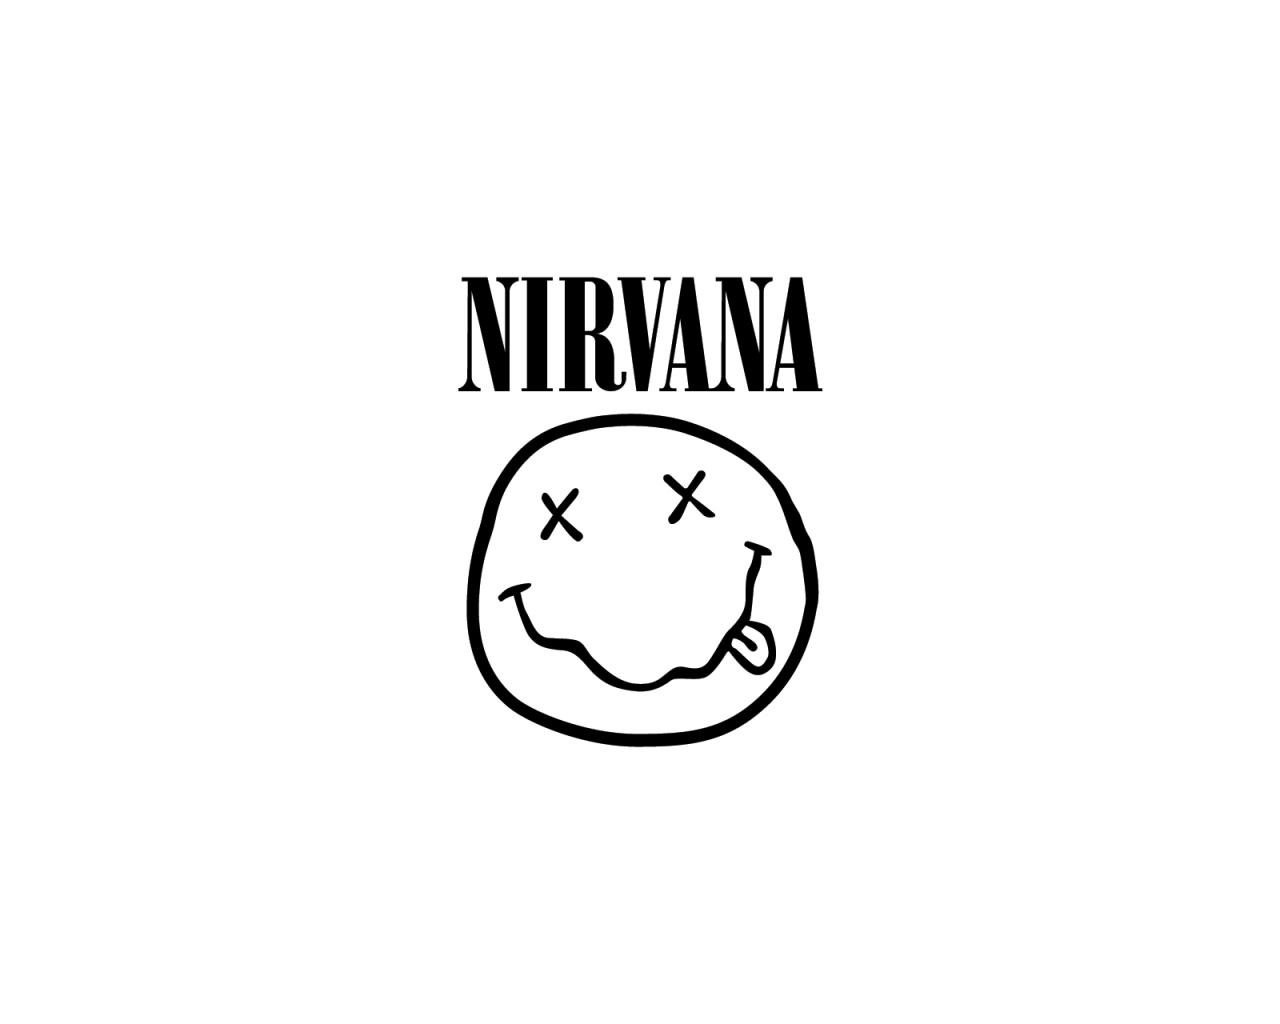 nirvana wallpaper hd 1280x1024 116836